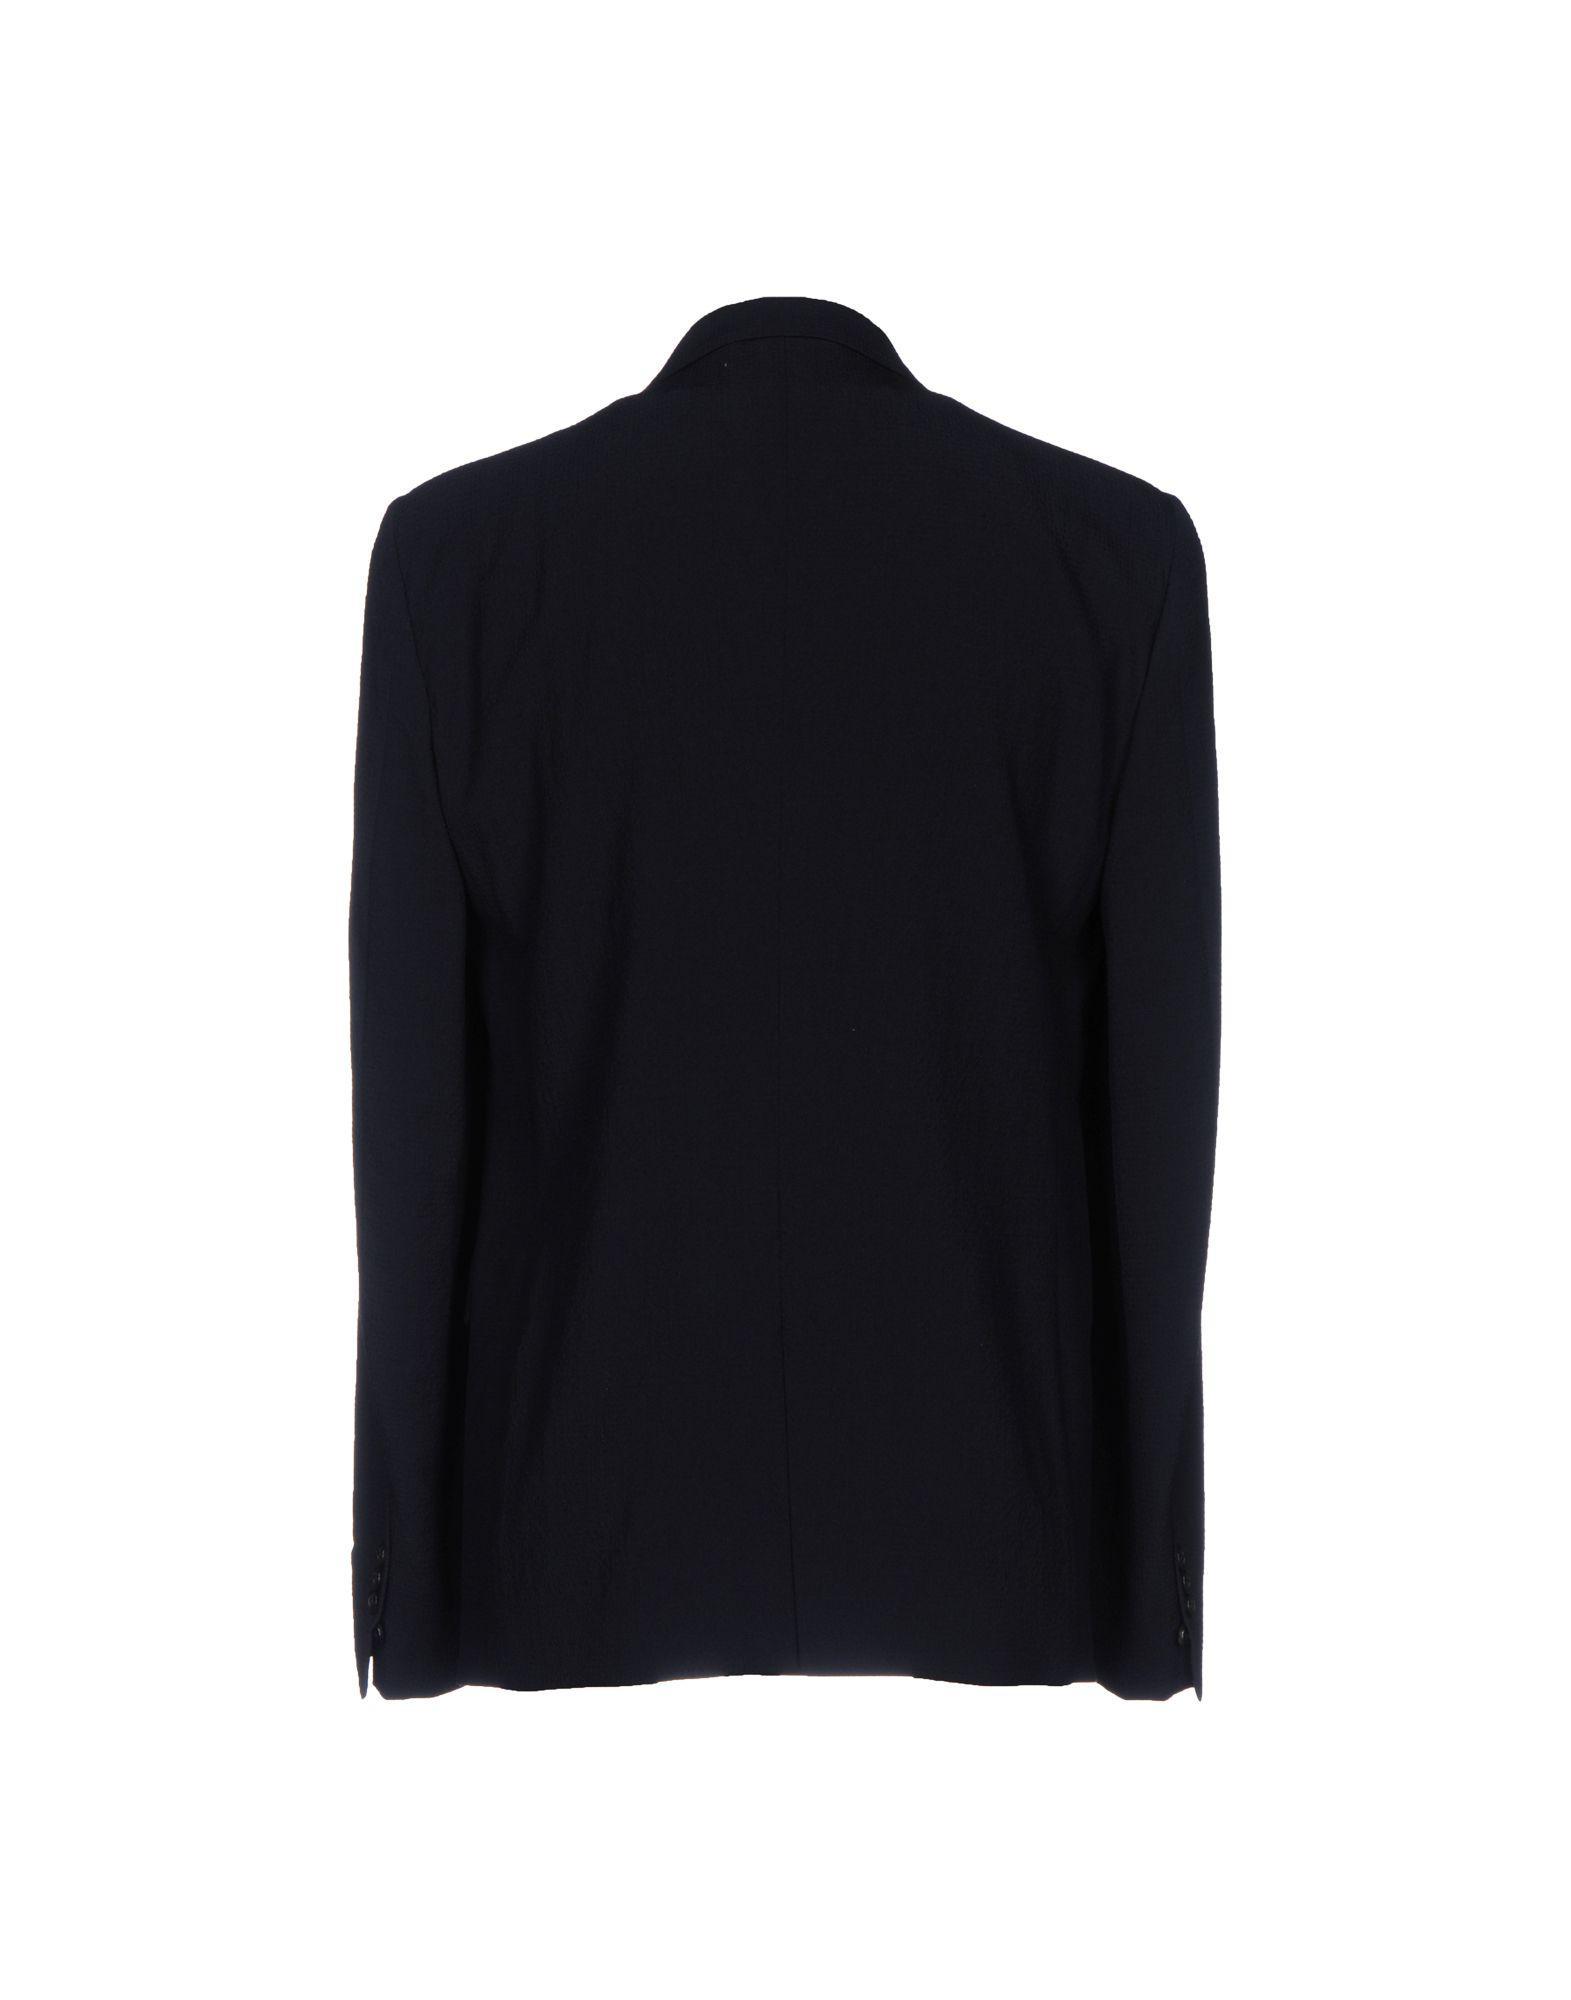 Marc Jacobs Wool Blazer in Dark Blue (Blue) for Men